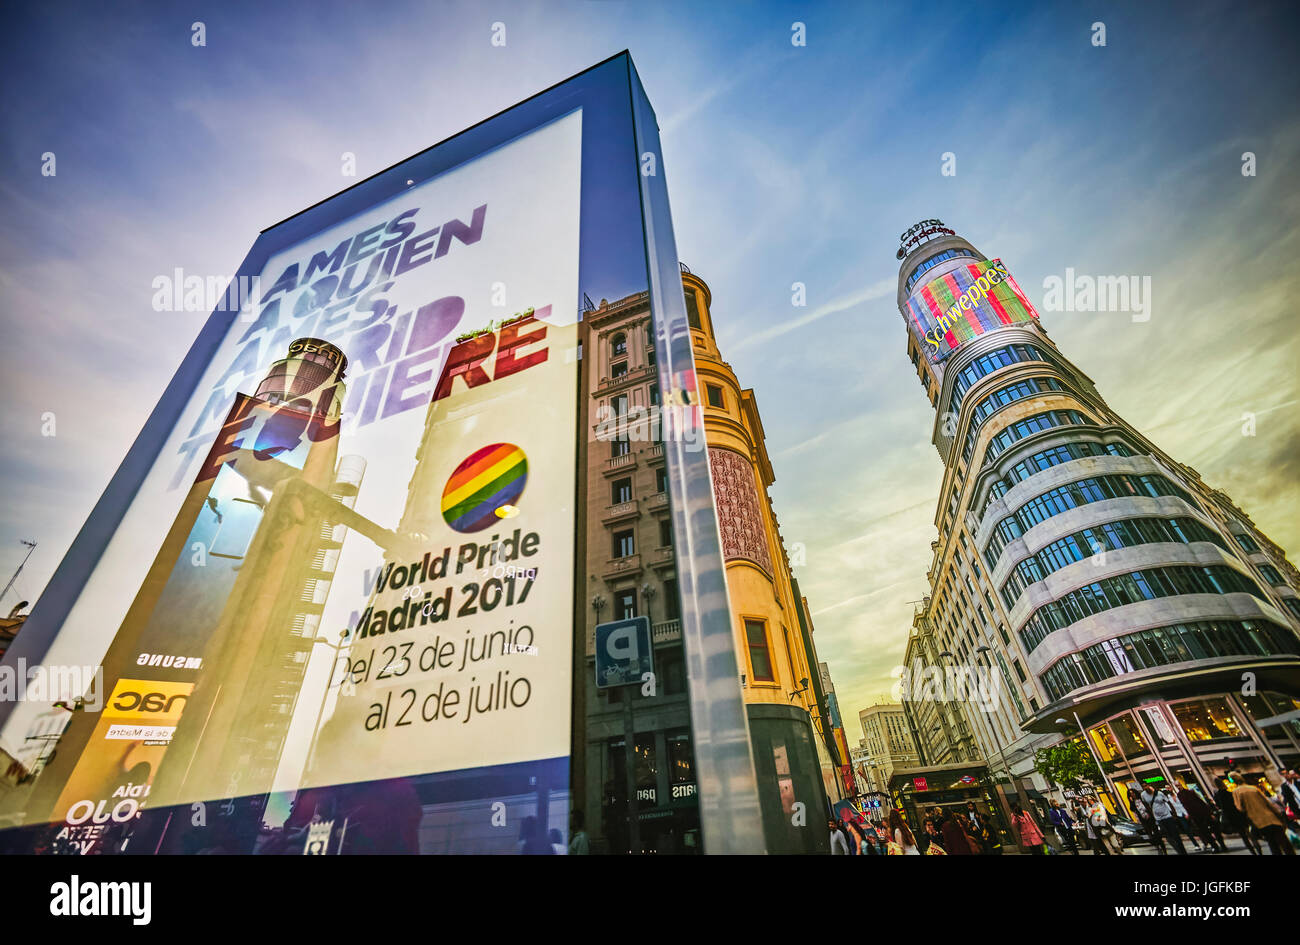 Mundo orgullo Madrid 2017 firmar en la Plaza Callao. Madrid. España. Imagen De Stock